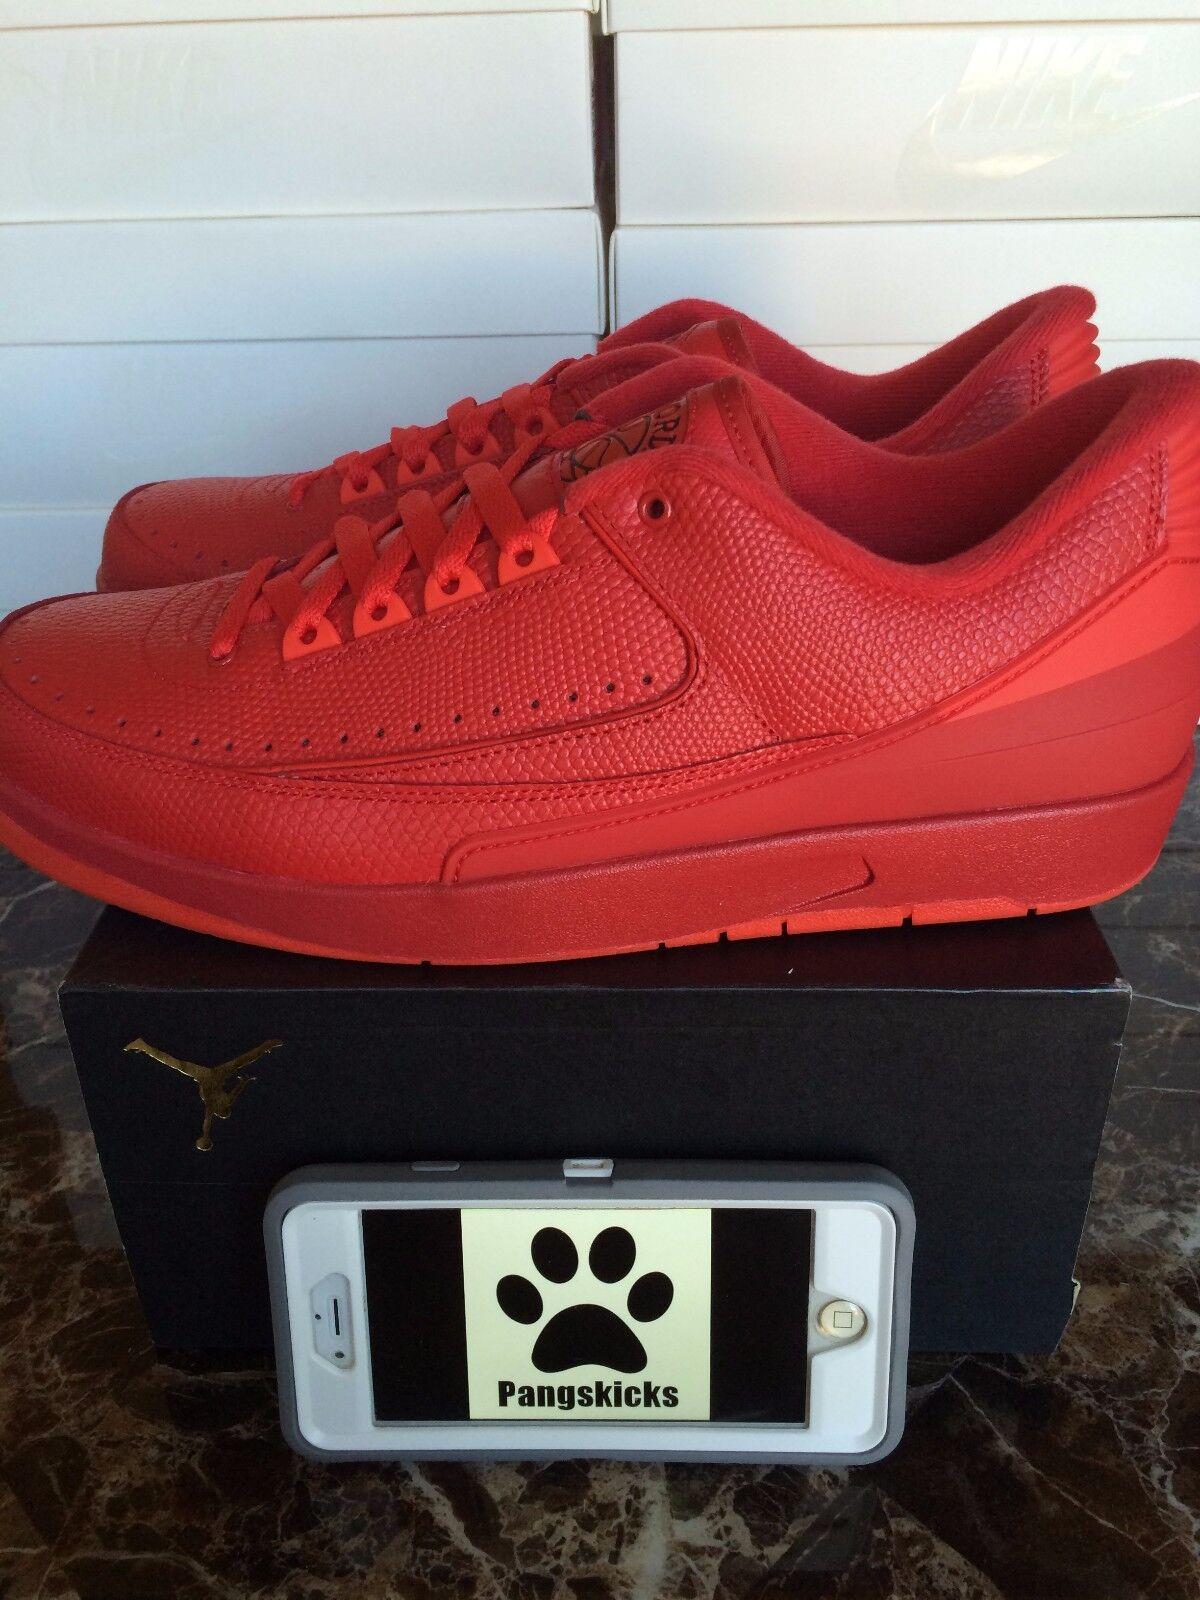 f5748665fa9a Купить Nike Air Jordan 2 Retro Low Gym Red на eBay.com из Америки с ...